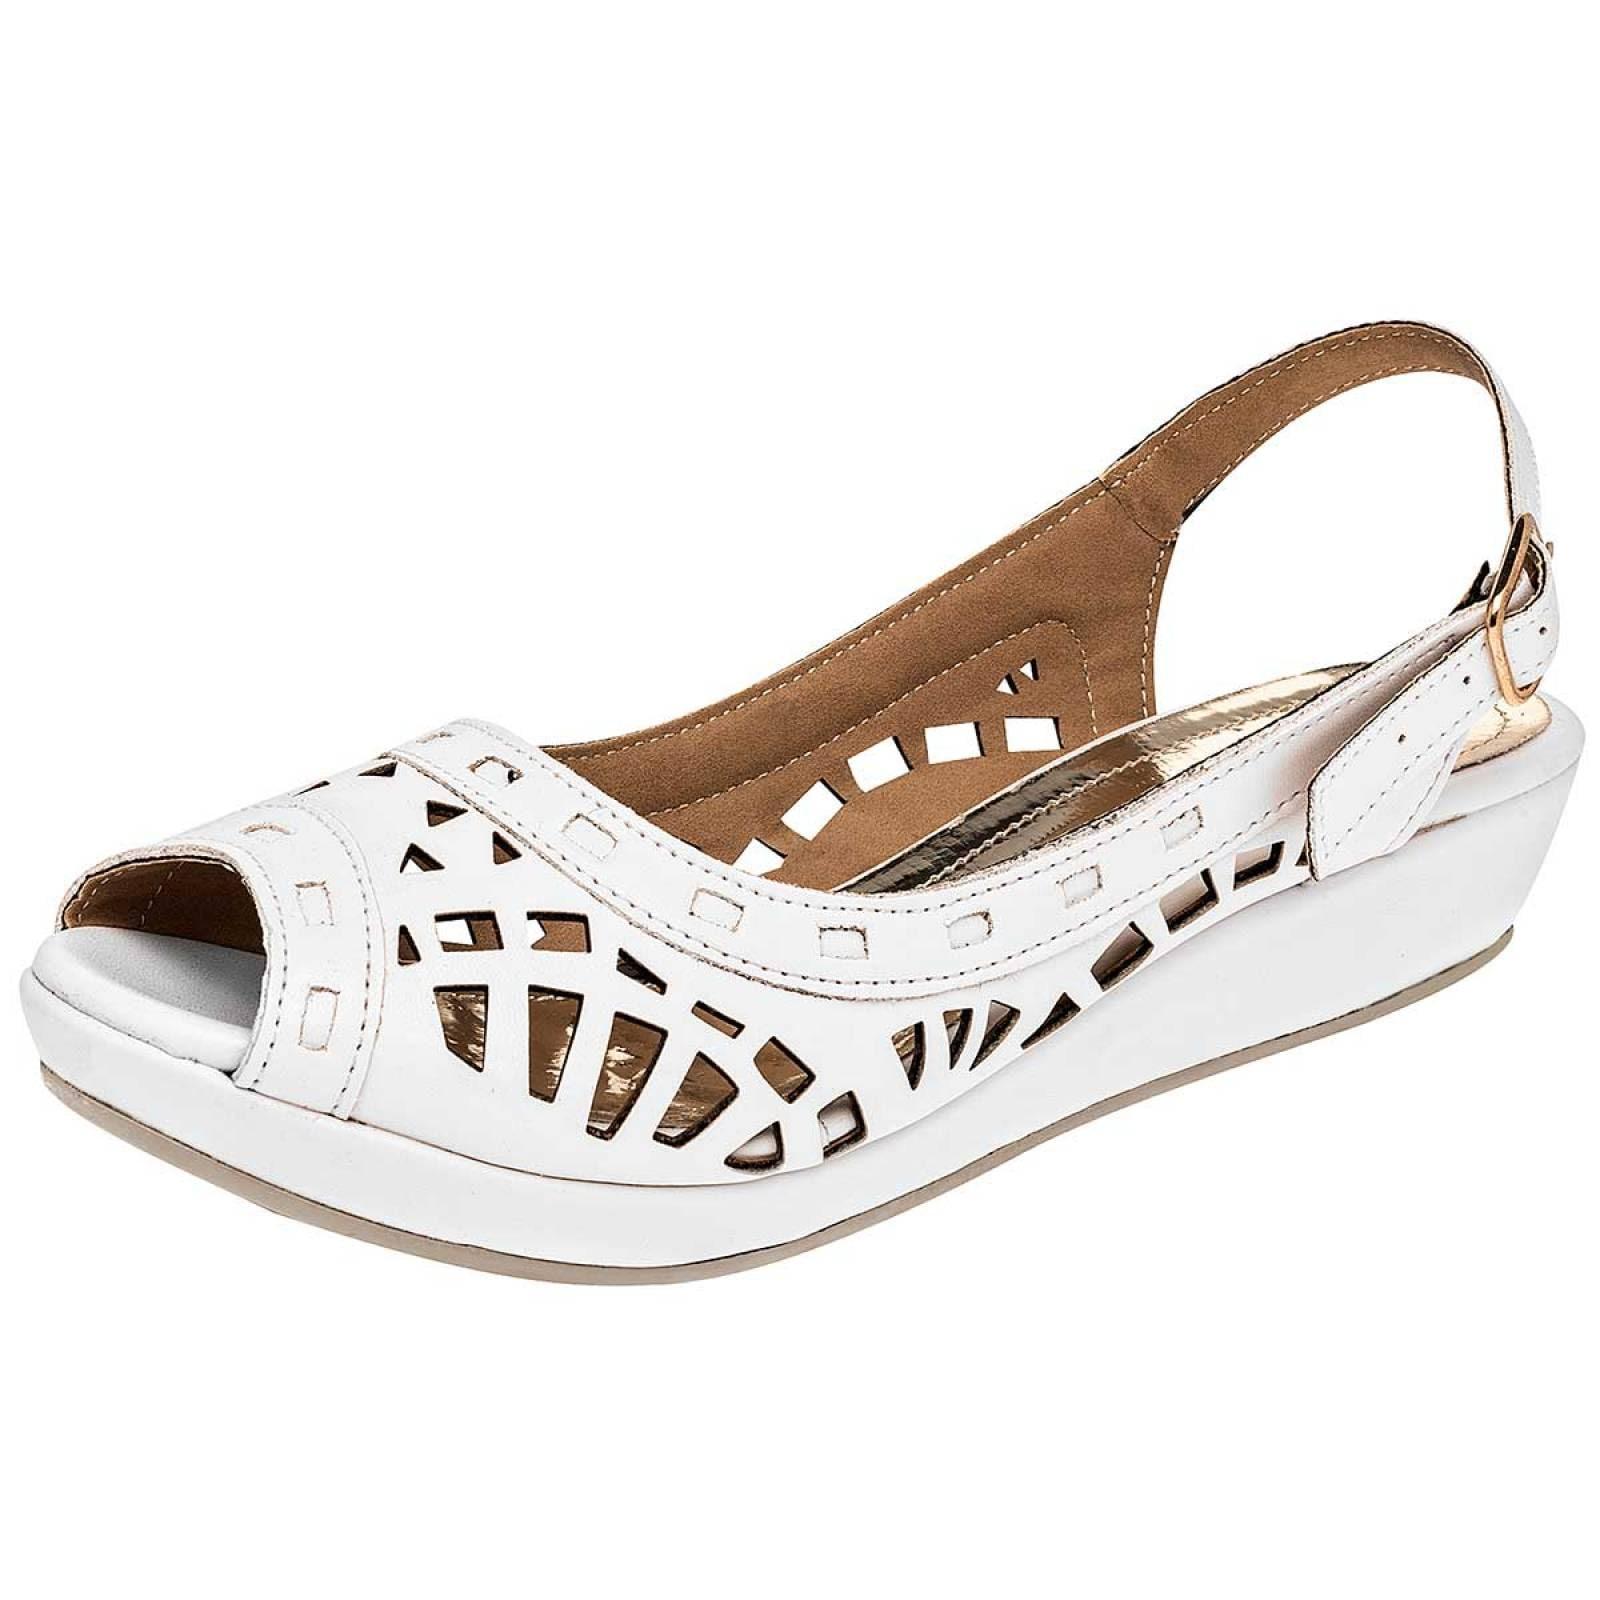 Kandy live Zapato Mujer Blanco